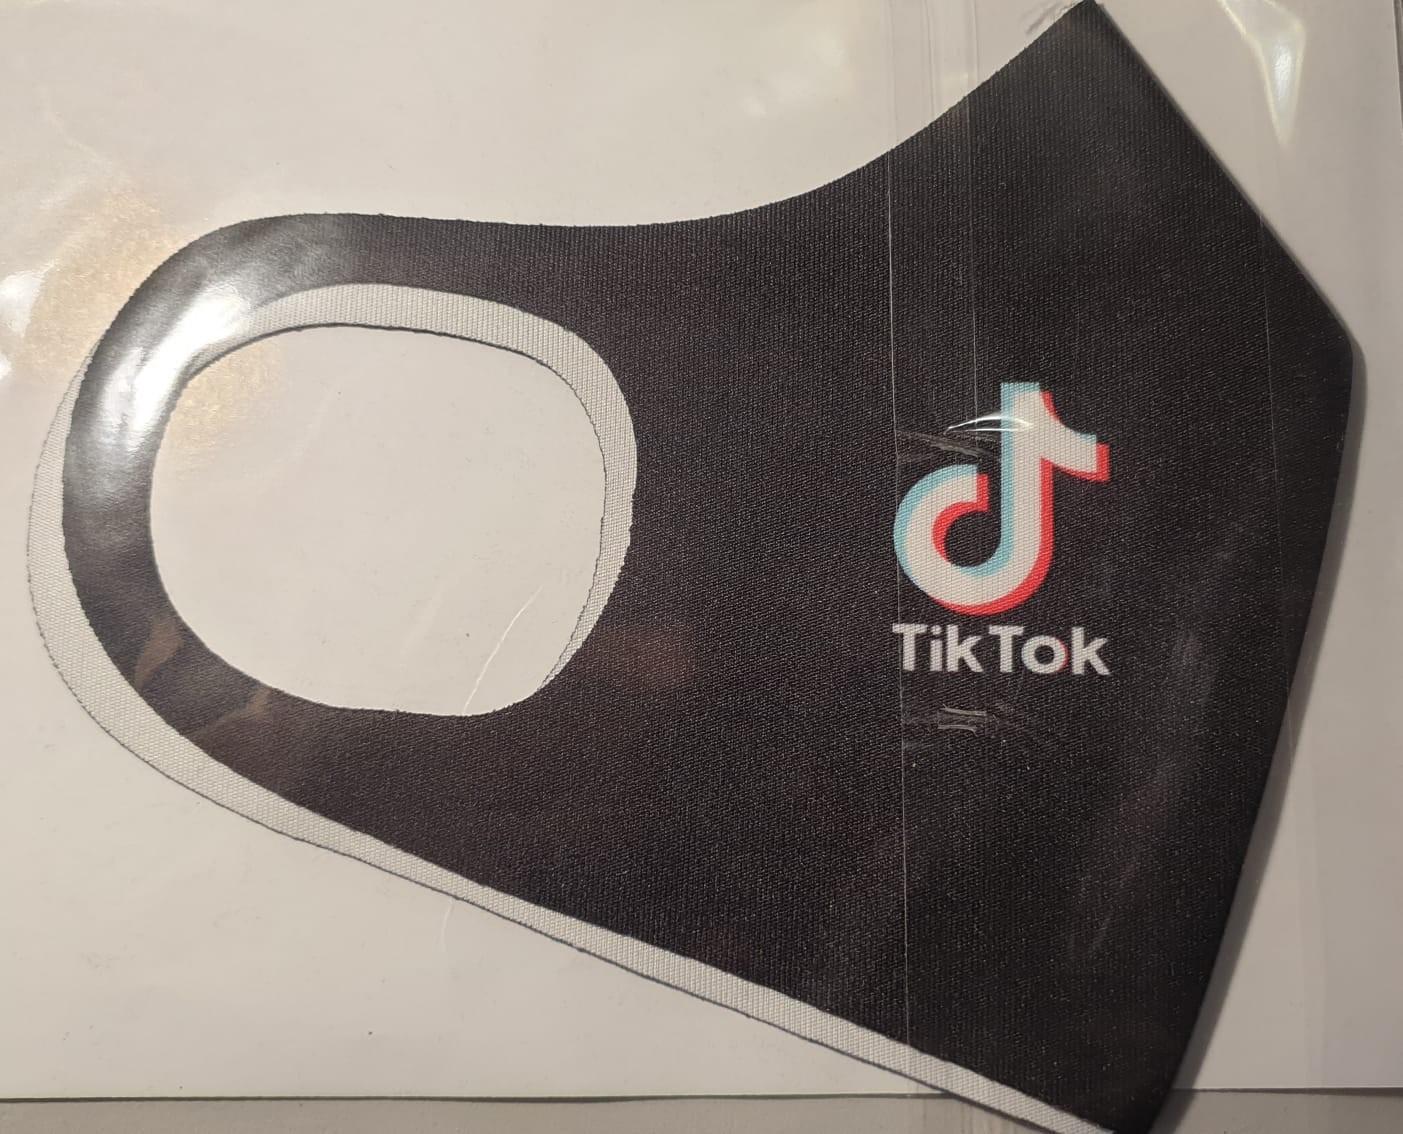 Masca protectie TIK TOK, reutilizabila .+ cadou imagine techstar.ro 2021